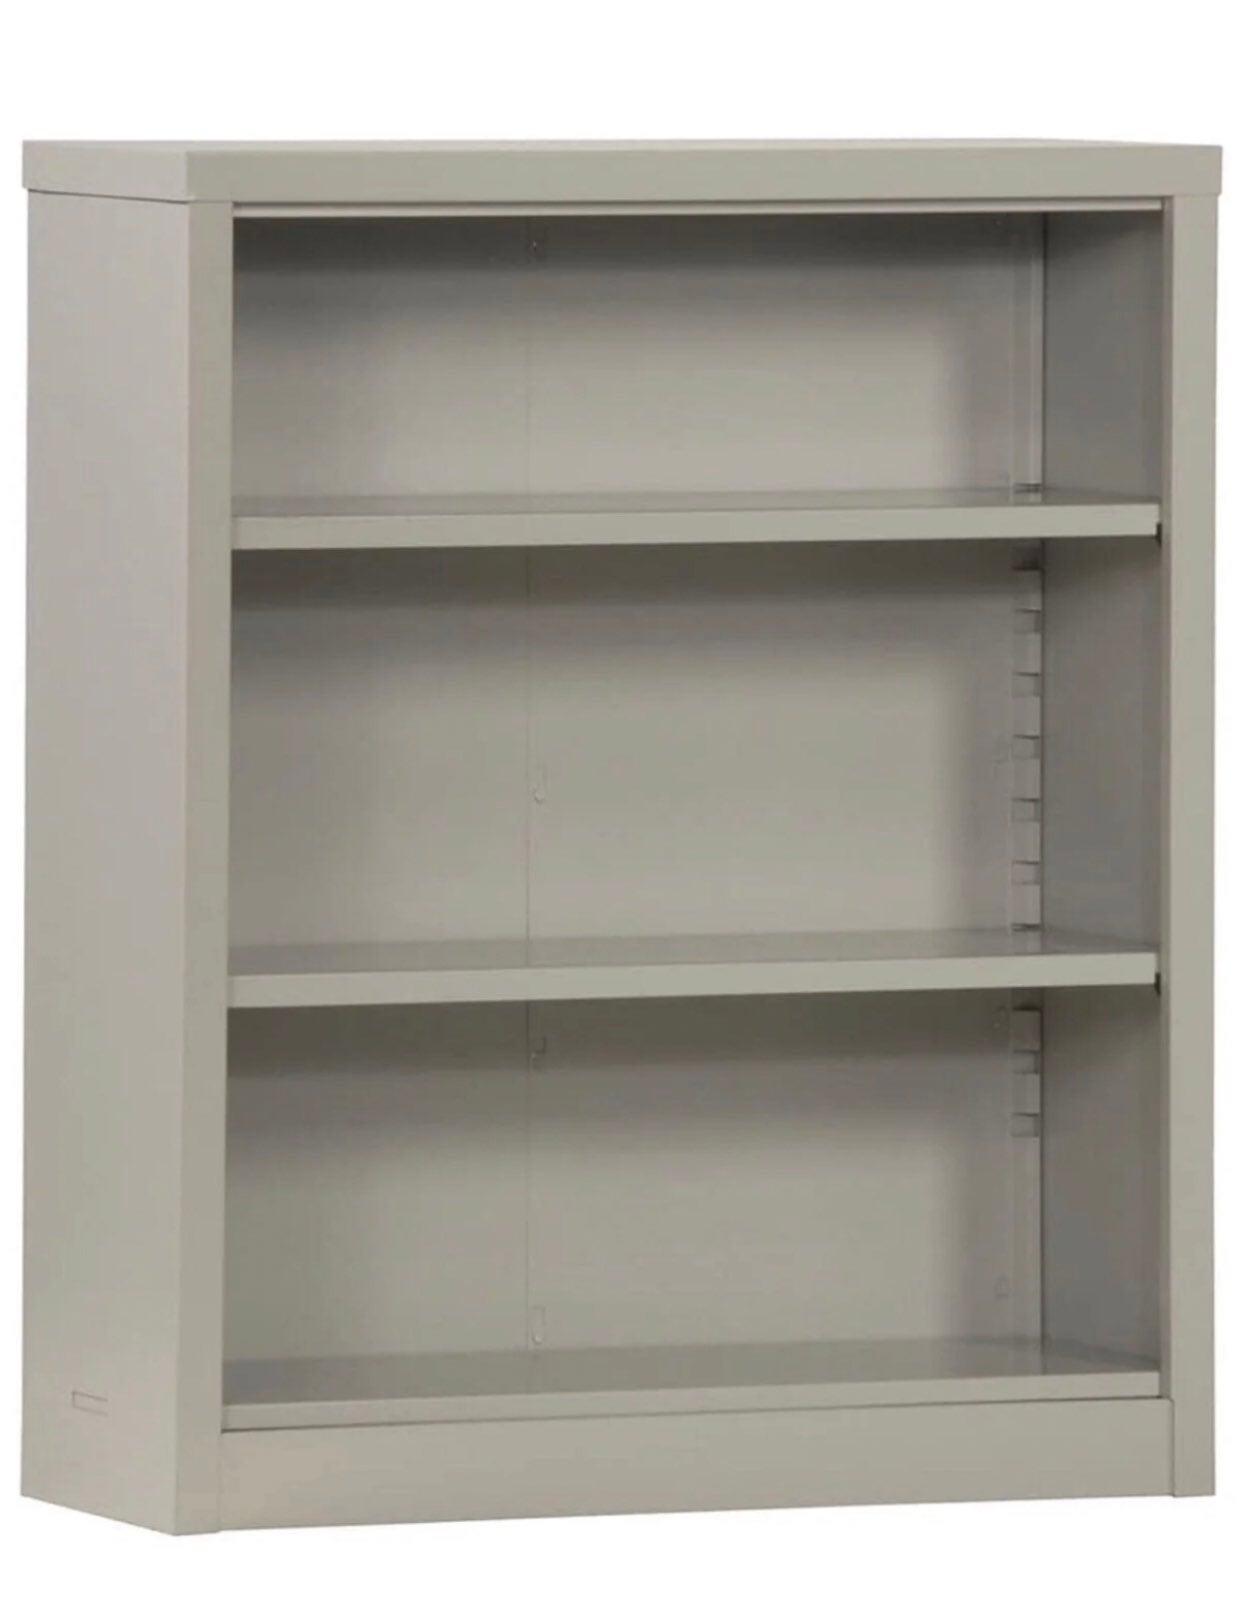 "Steel Bookcase Bookshelf 42"" Height"